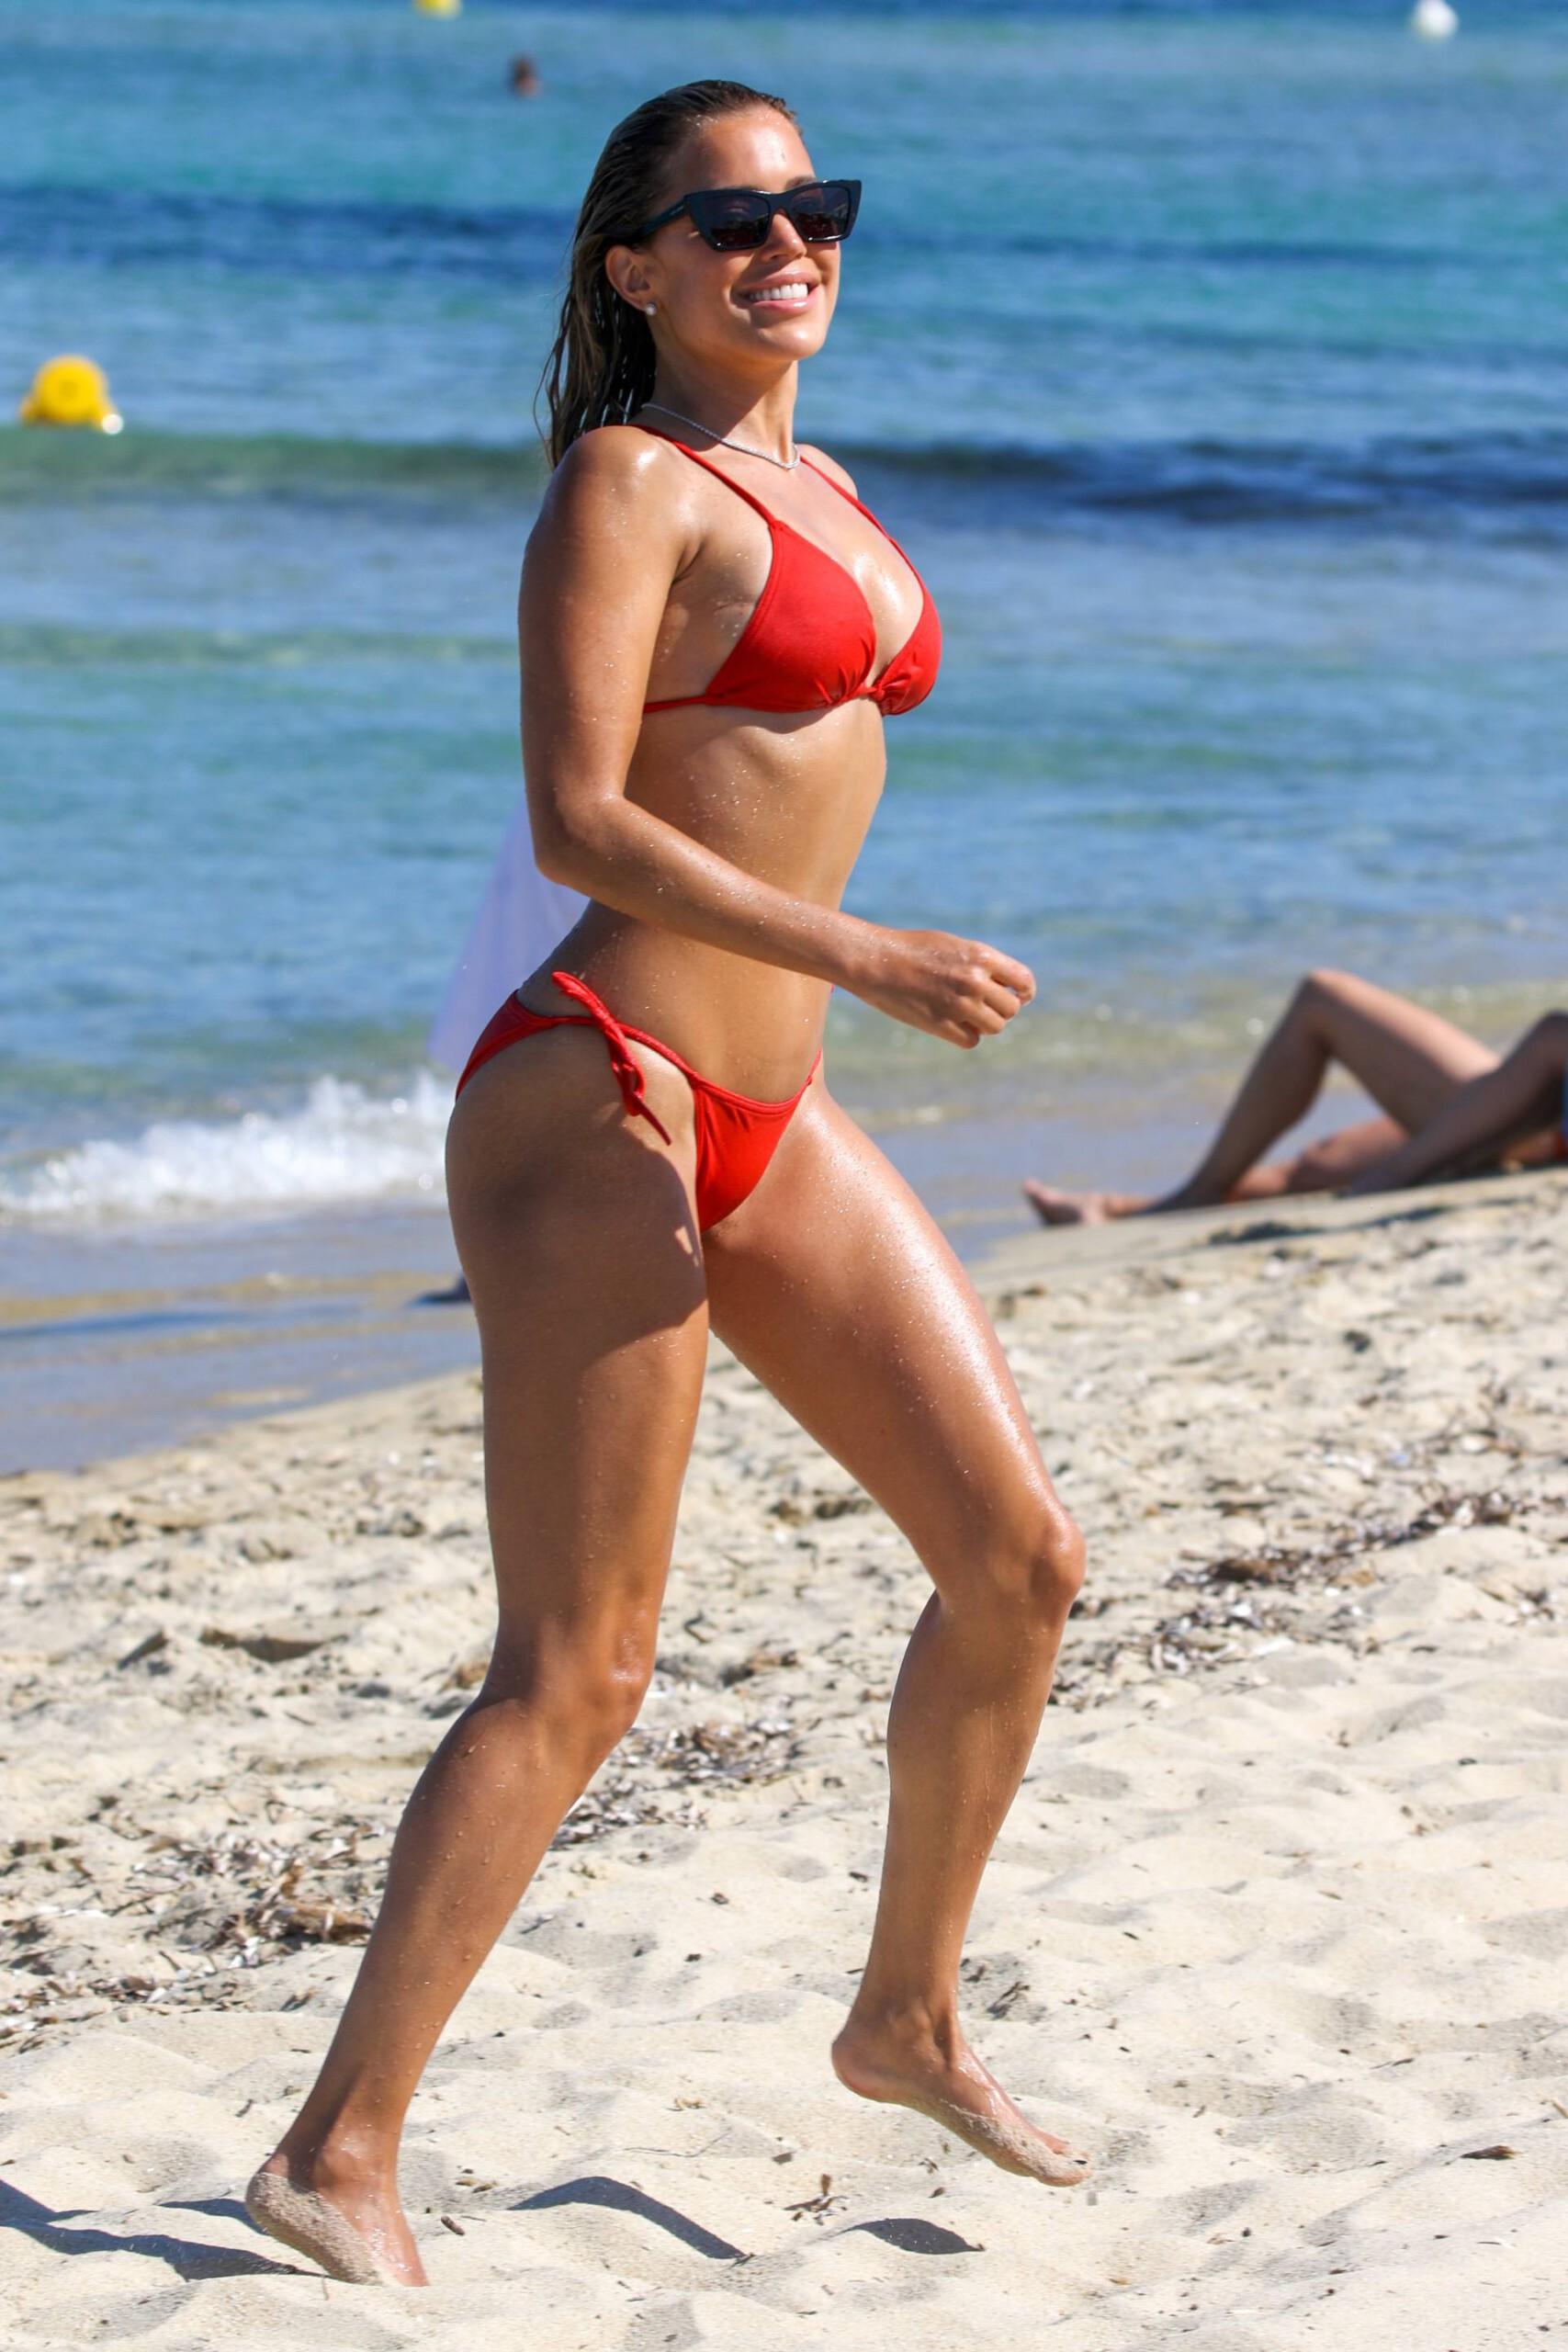 Sylvie Meis – Beautiful Body In Sexy Bikini On The Beach In Saint Tropez 0019